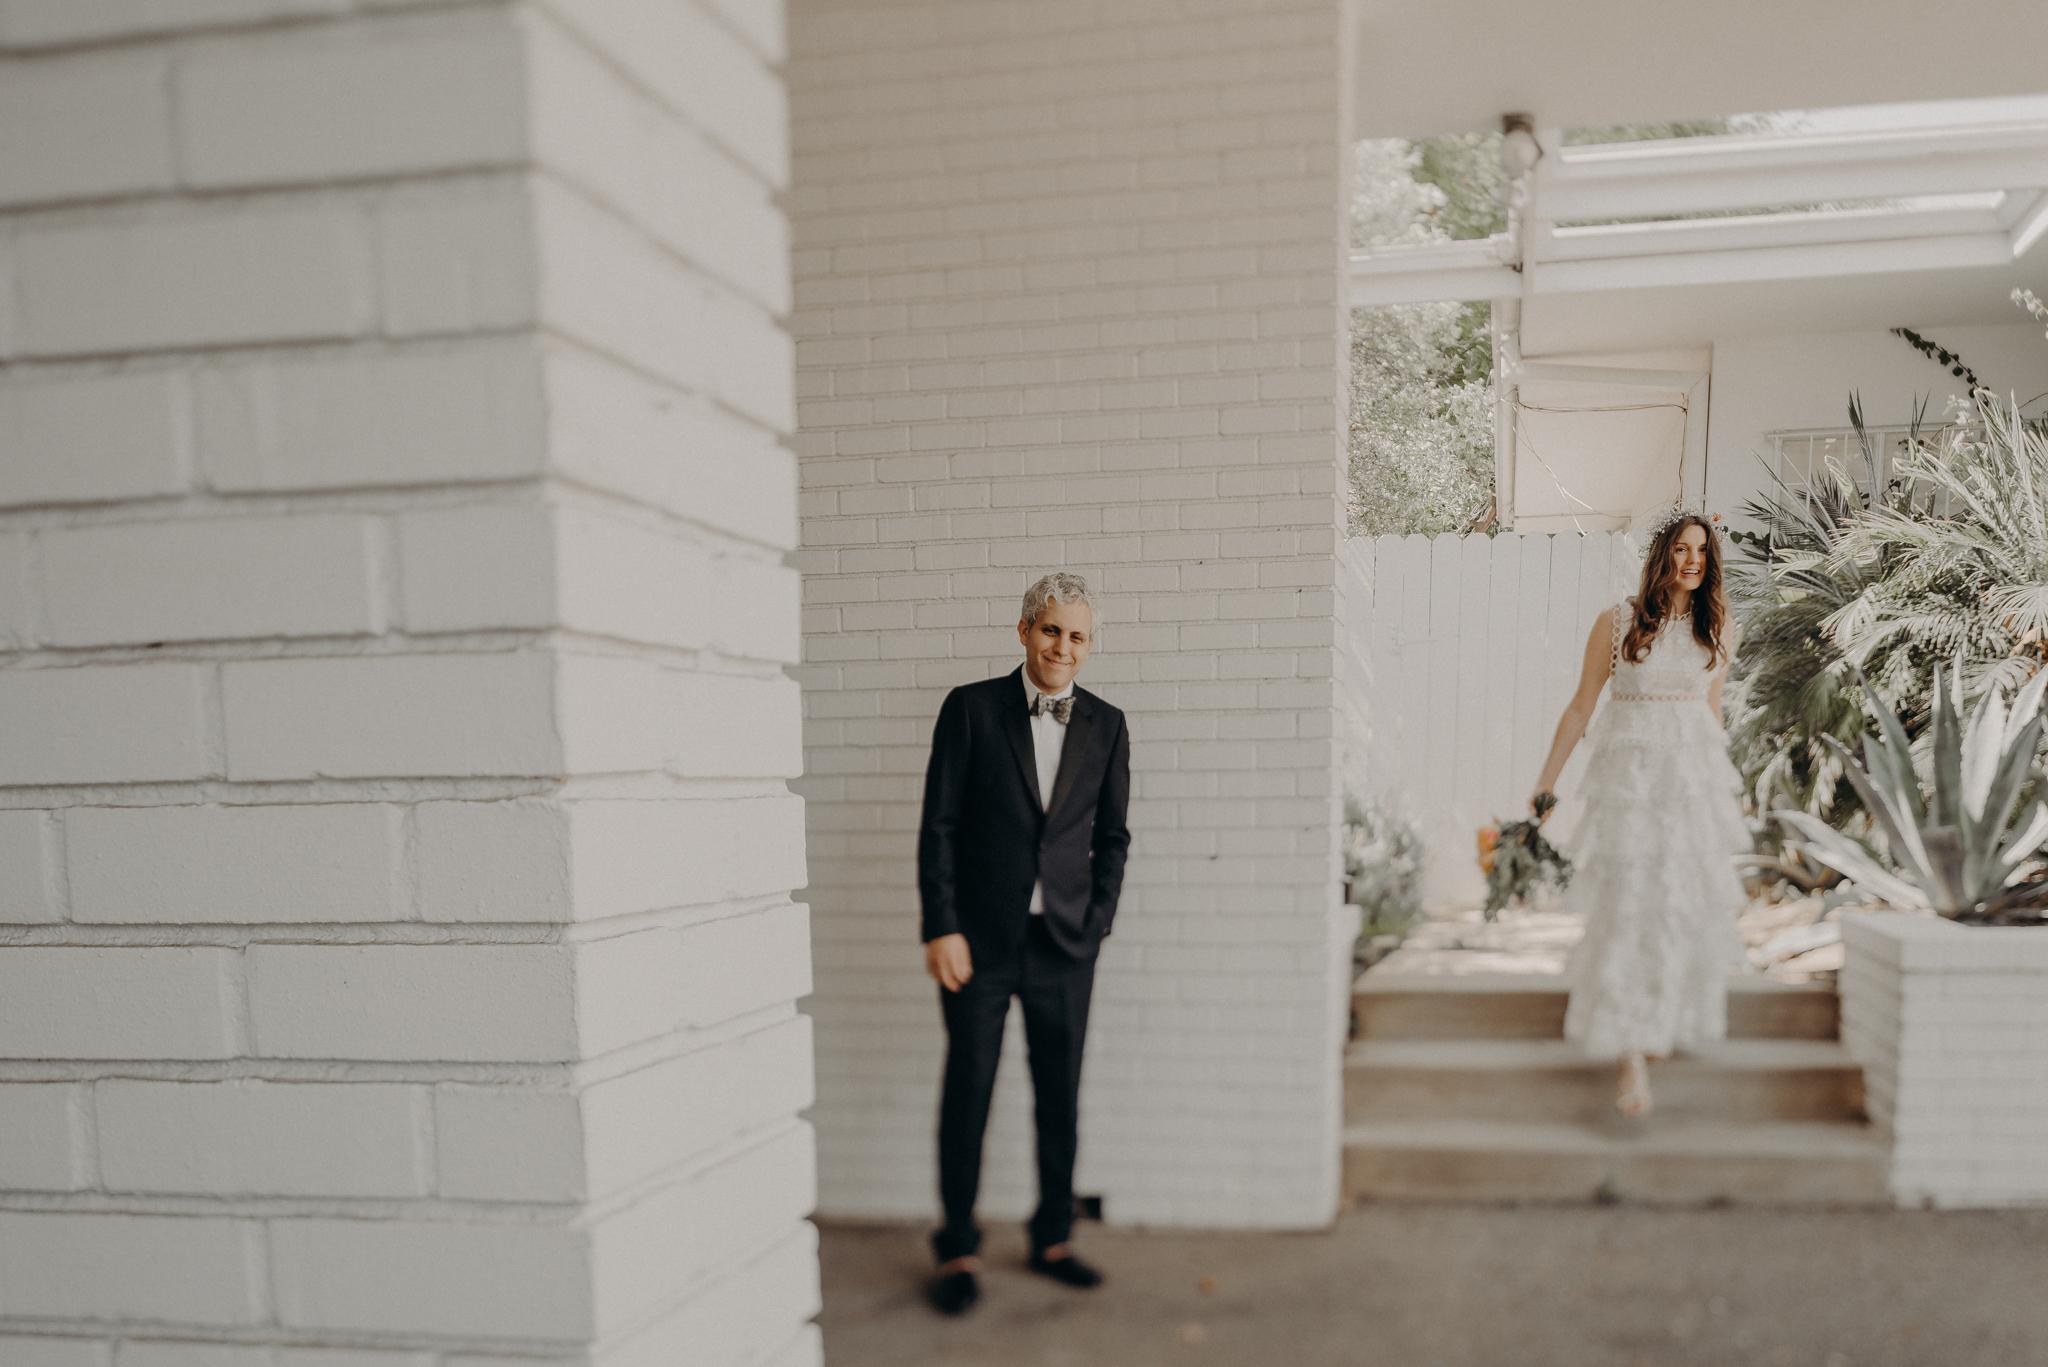 Isaiah + Taylor Photography - Private Estate Backyard Wedding - Beverly Hills - Los Angeles Wedding Photographer - 28.jpg